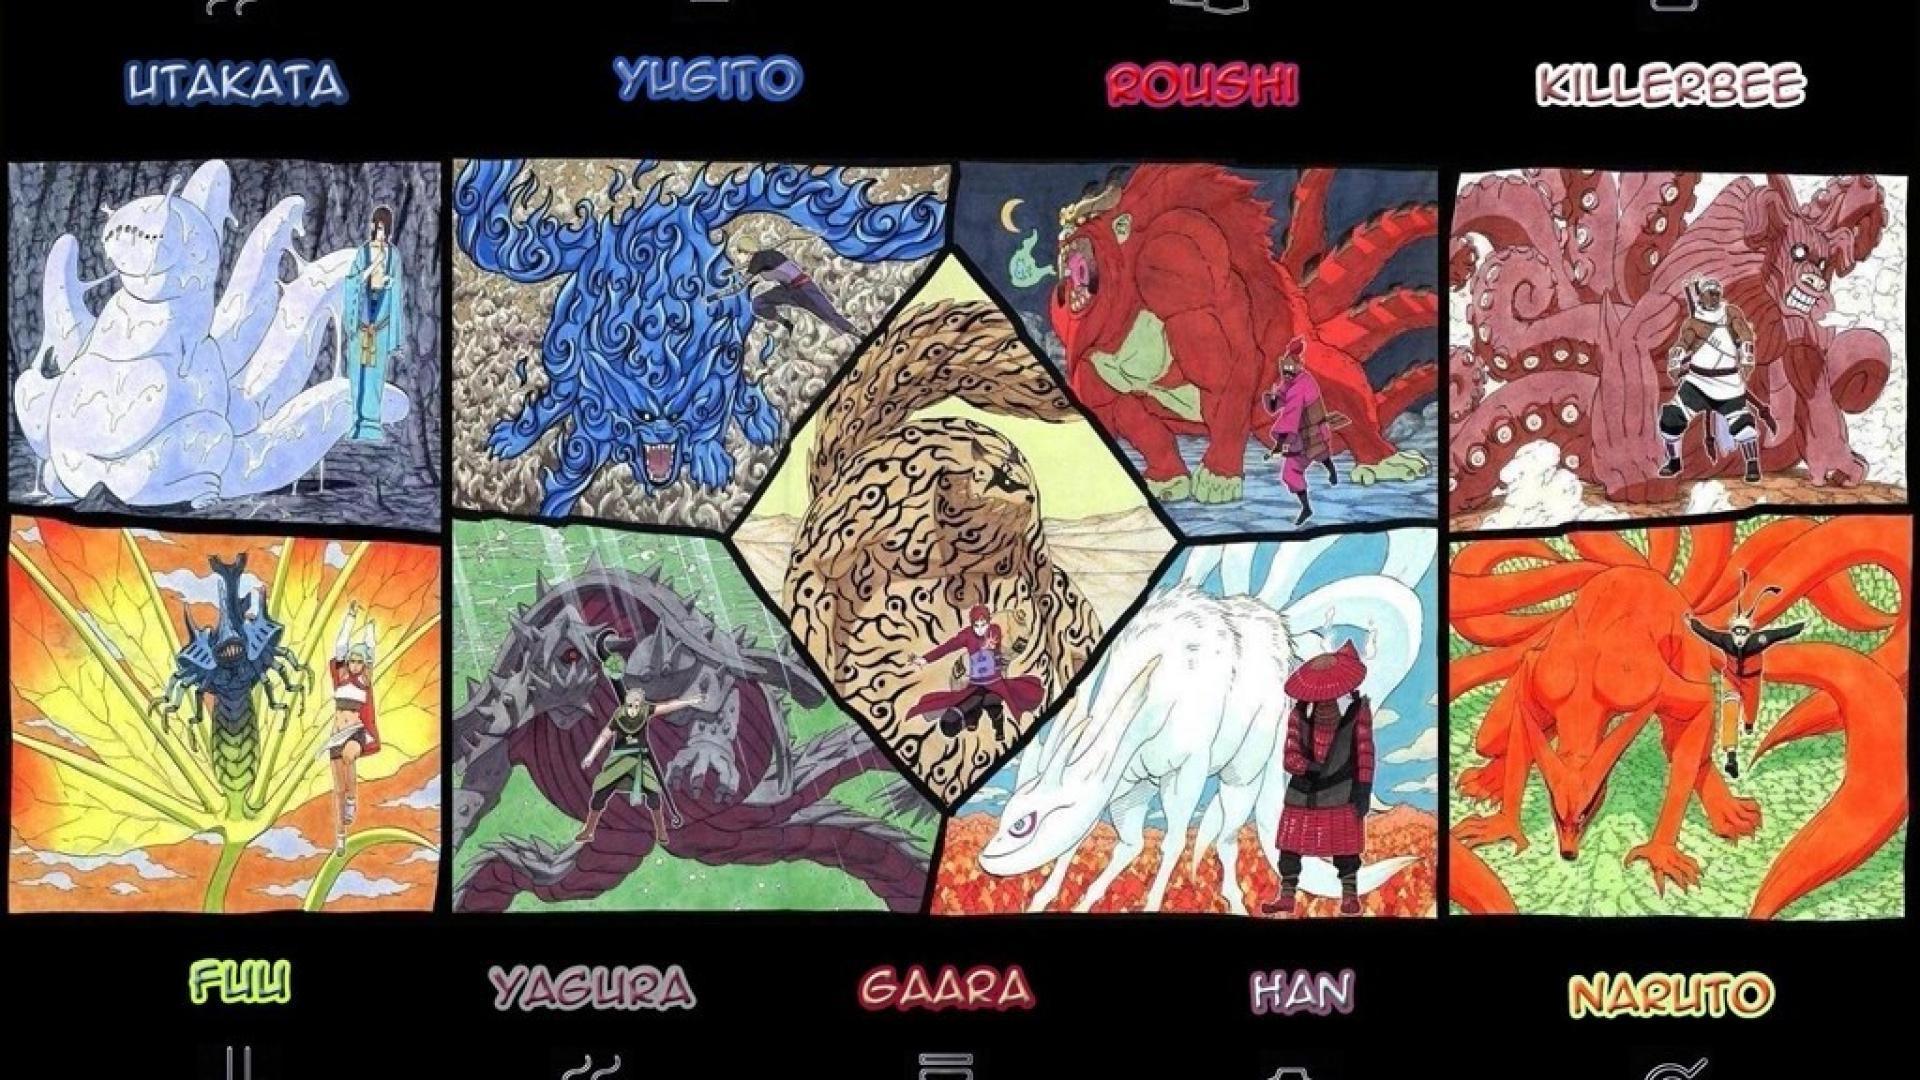 Killer Bee Naruto Wallpapers - Wallpaper Cave